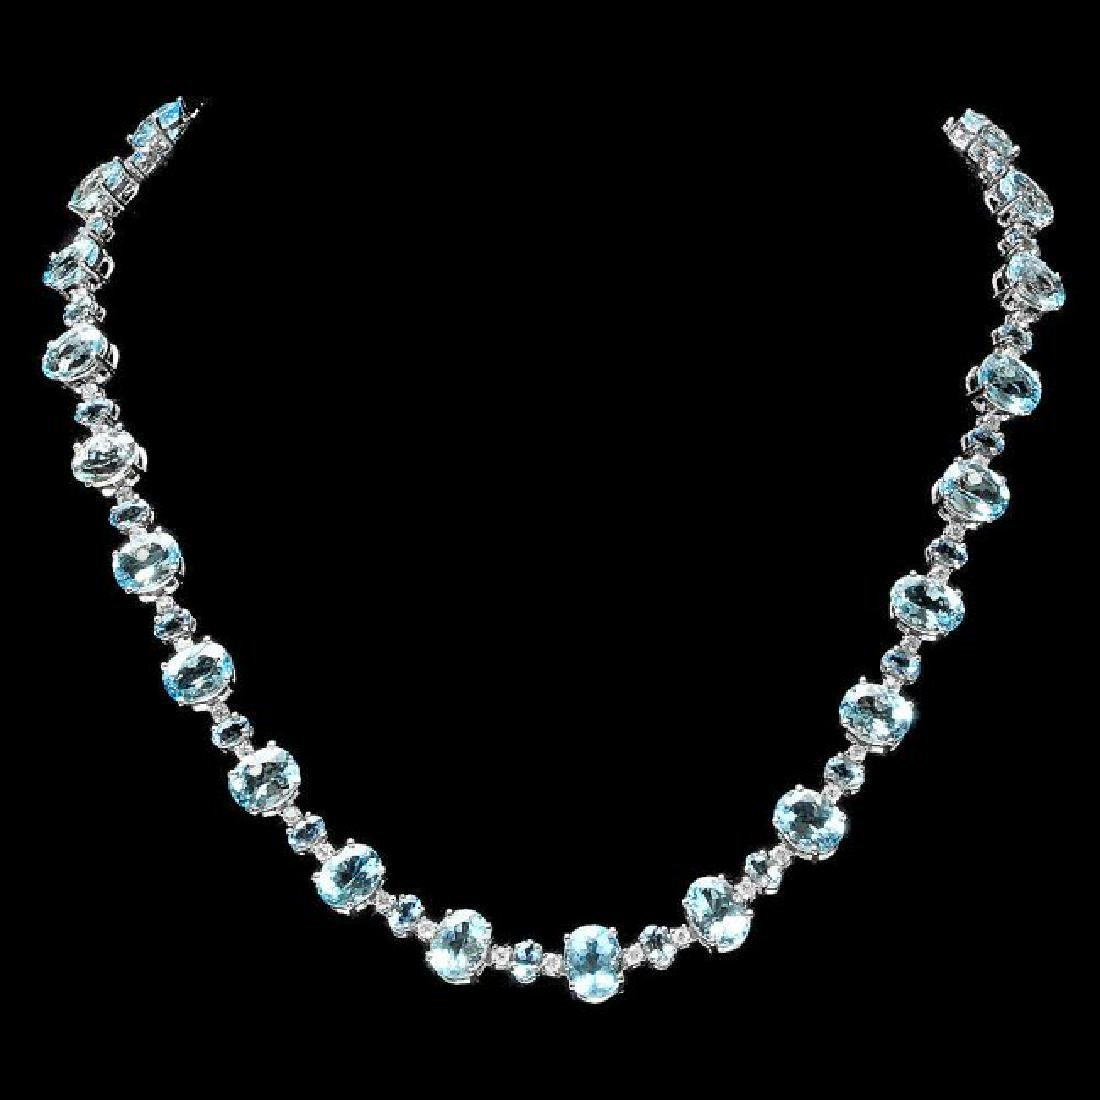 14k Gold 49ct Aquamarine 2.40ct Diamond Necklace